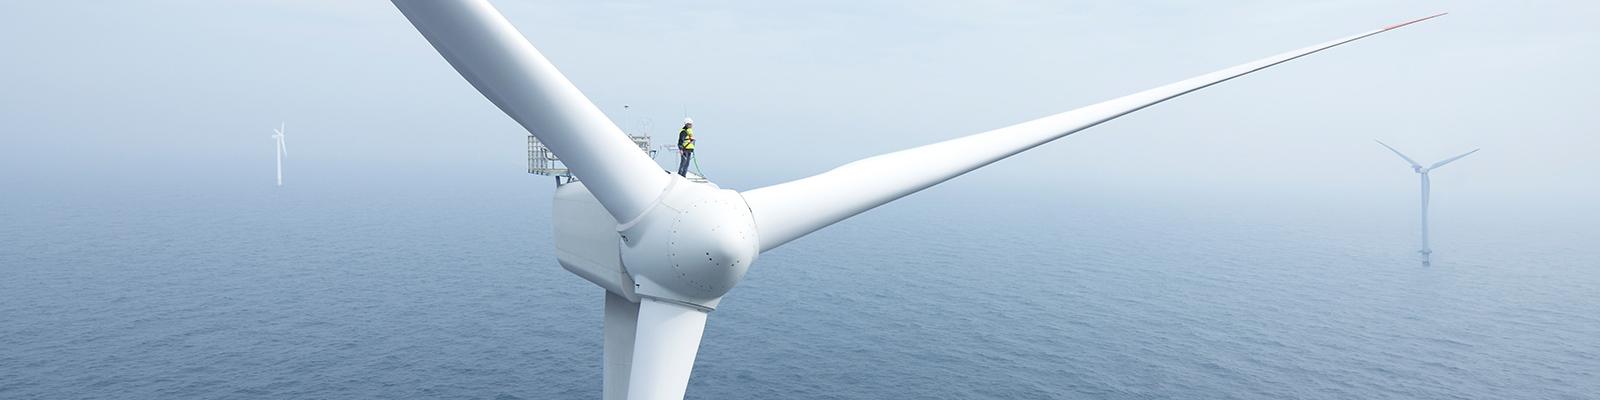 Offshore wind farm; Source: ABB